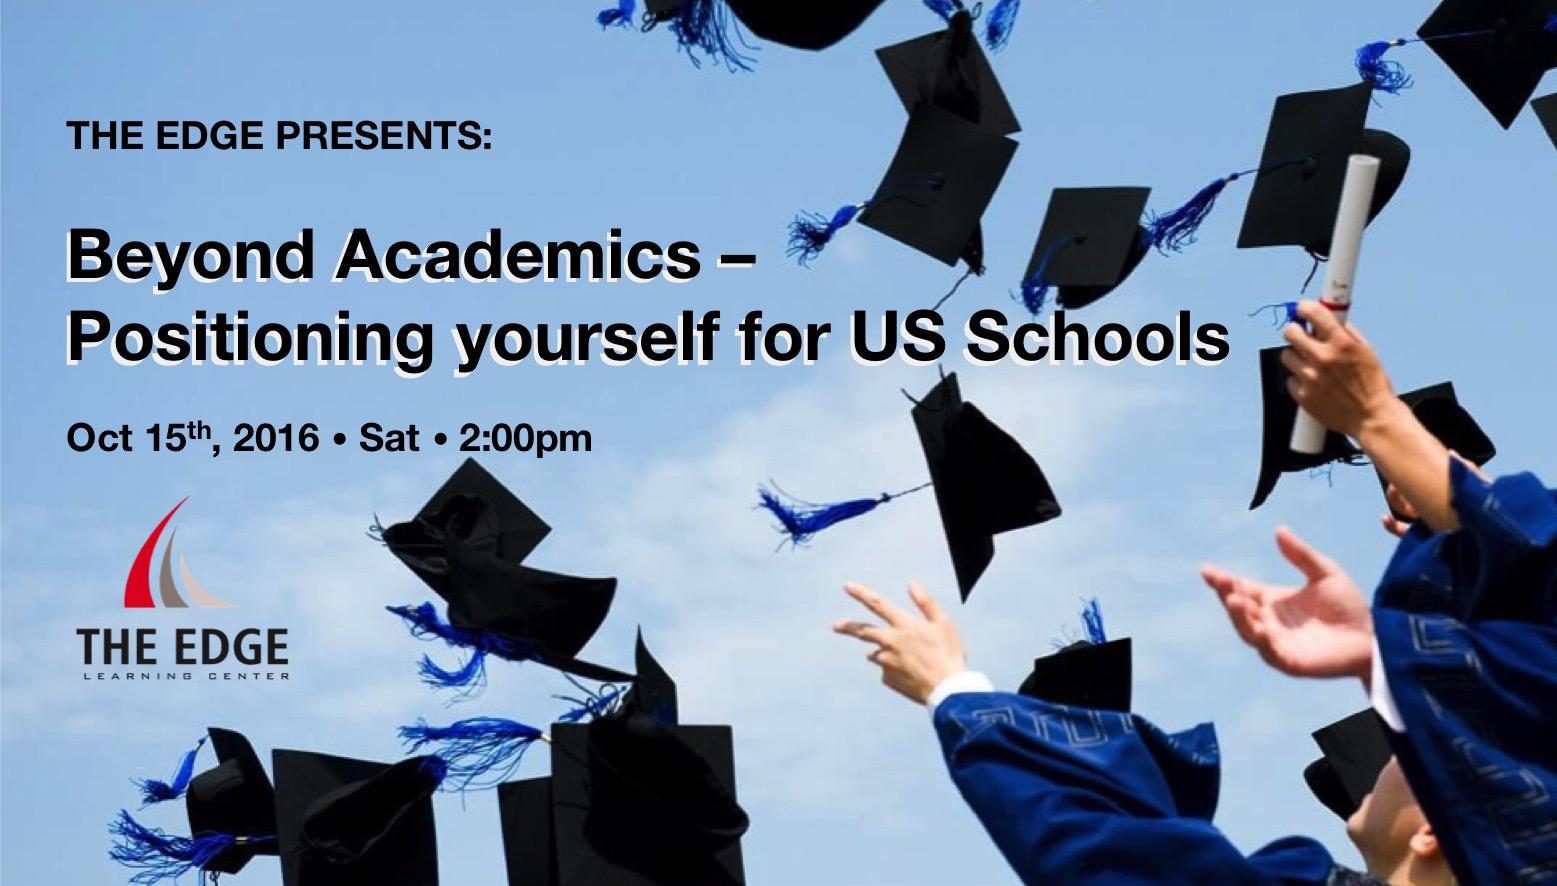 beyond-academics-seminar-20161015